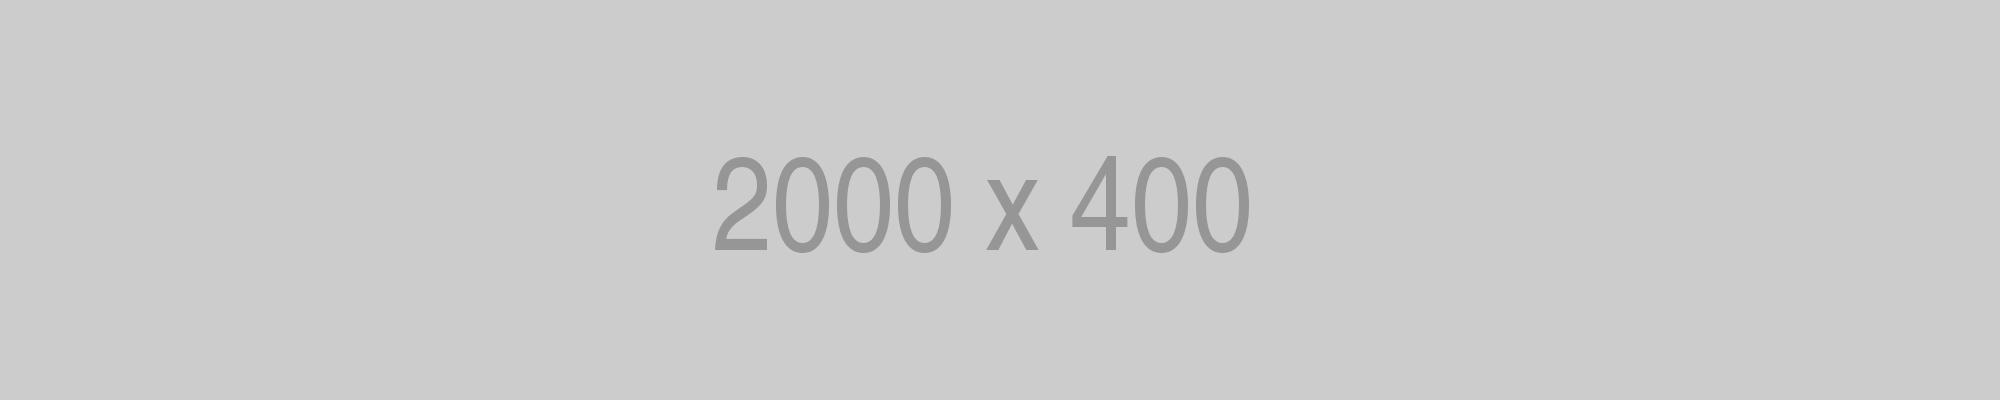 Placeholder Image - 2000x400